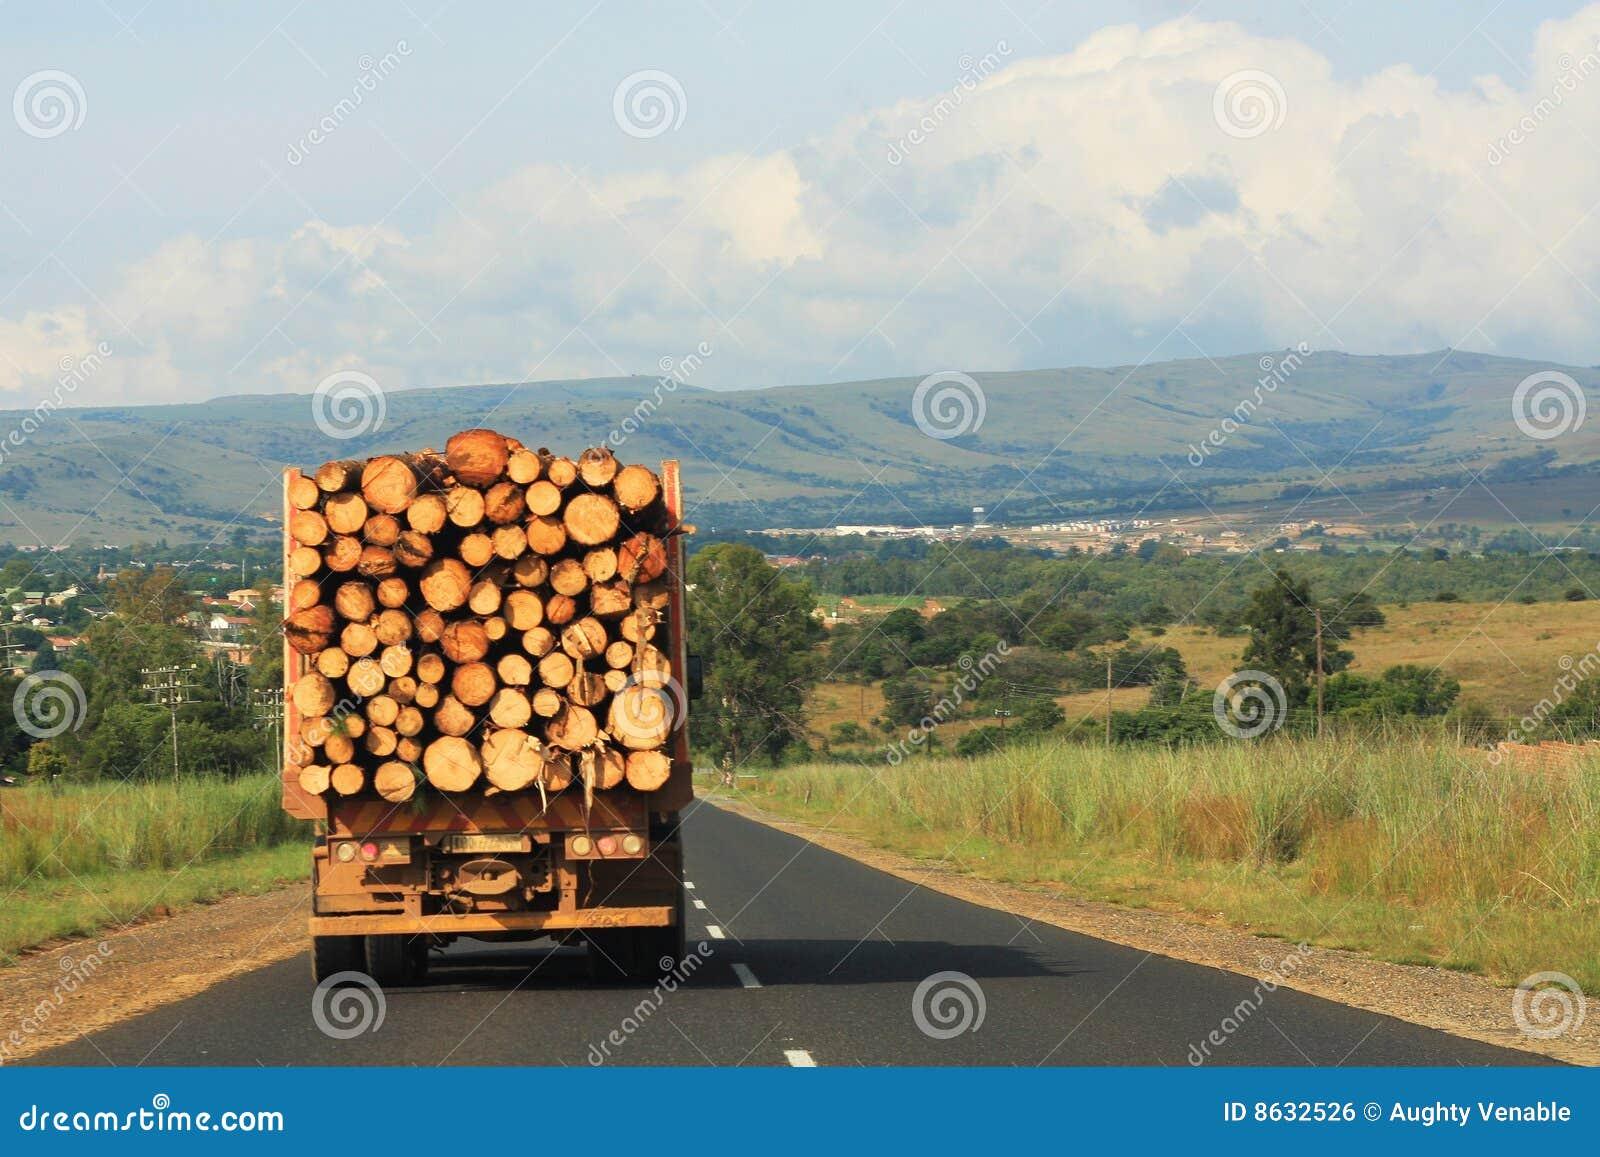 Transportation of Logs